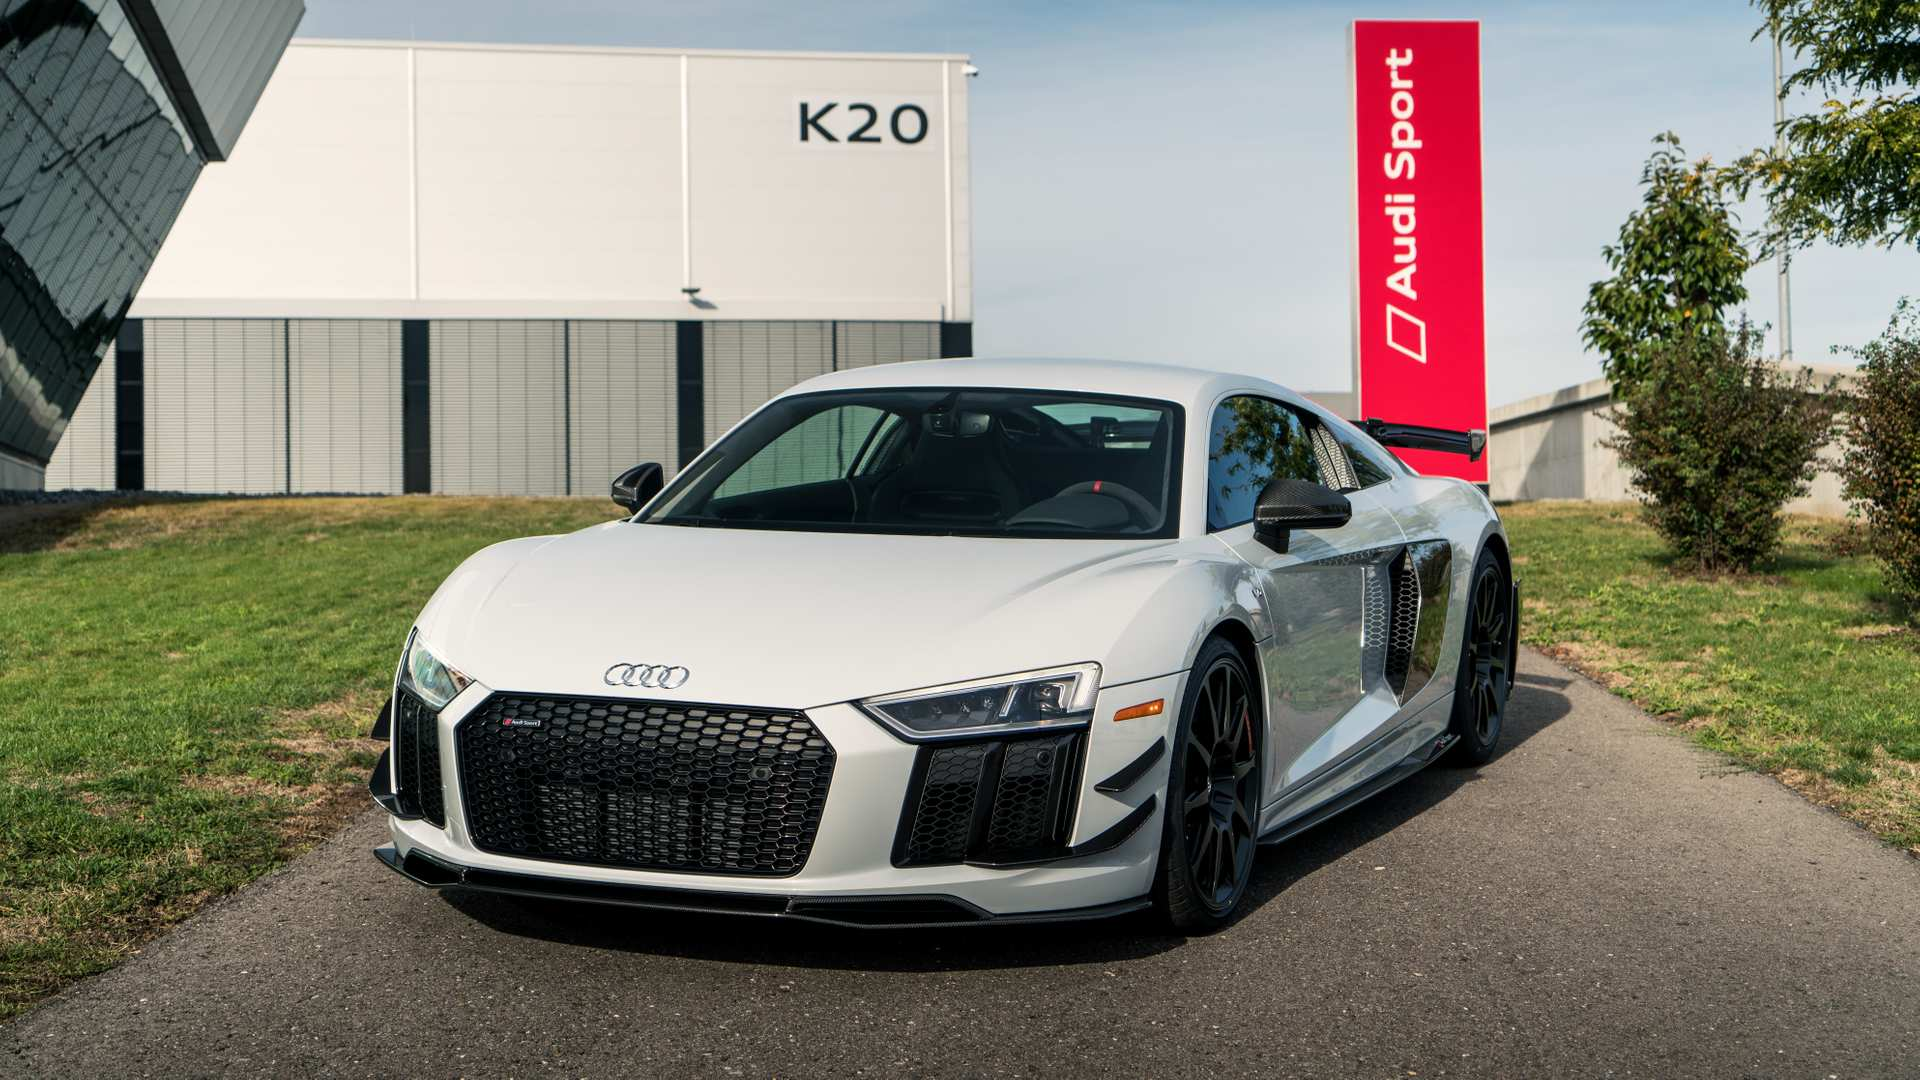 Audi представила особую версию купе R8 V10 plus